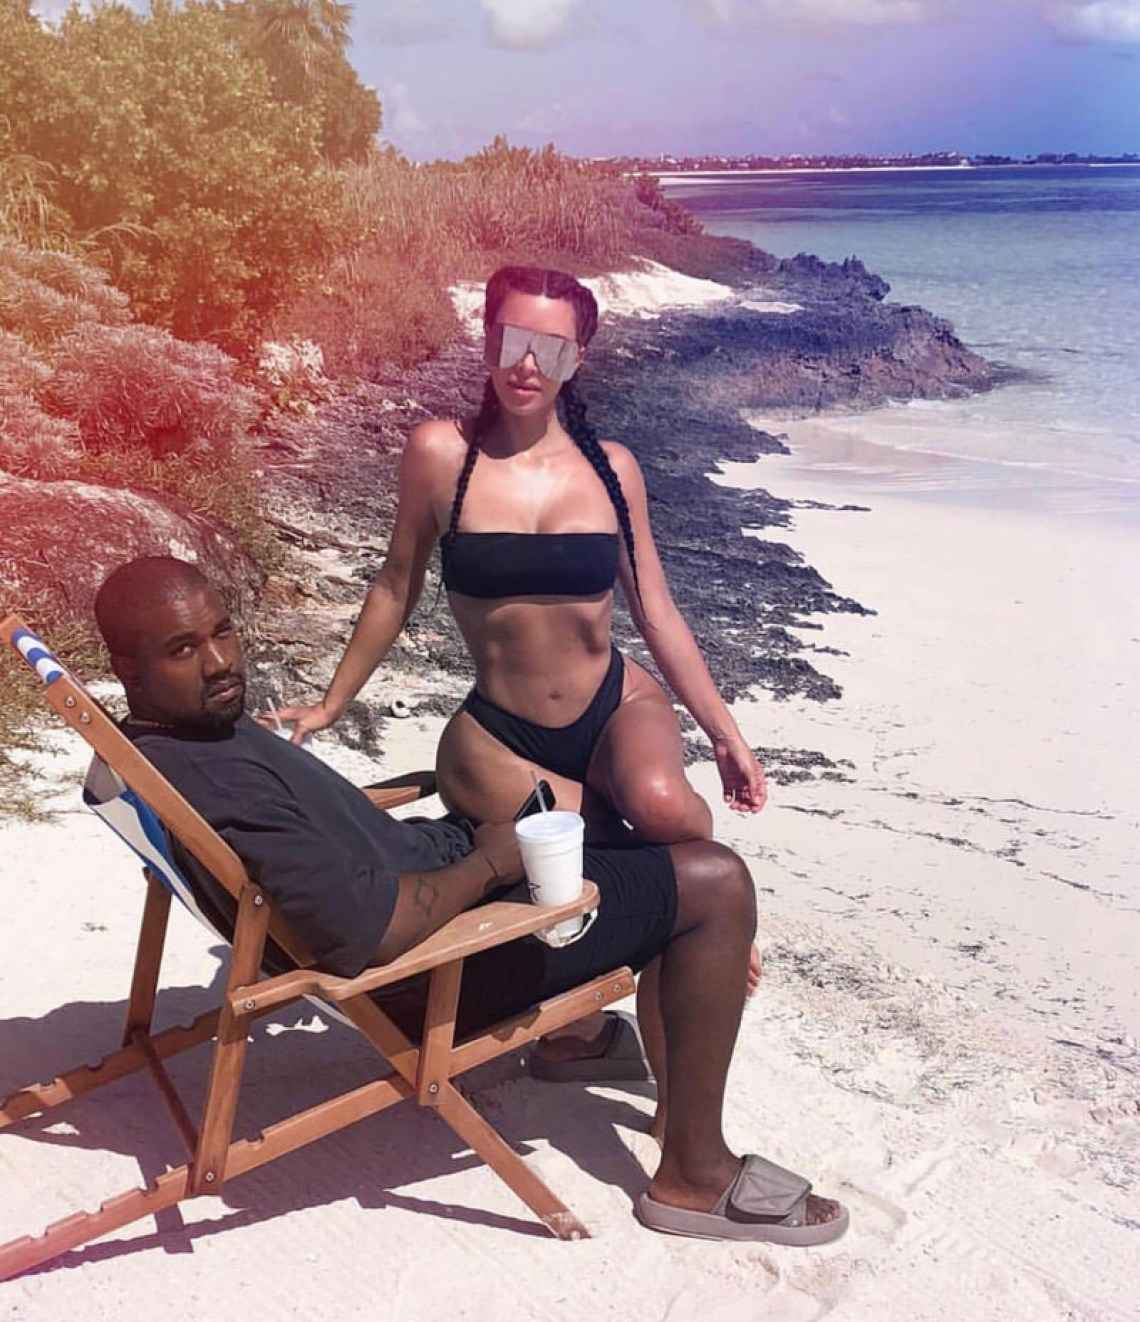 Kanye West in the Yeezy Season Slides